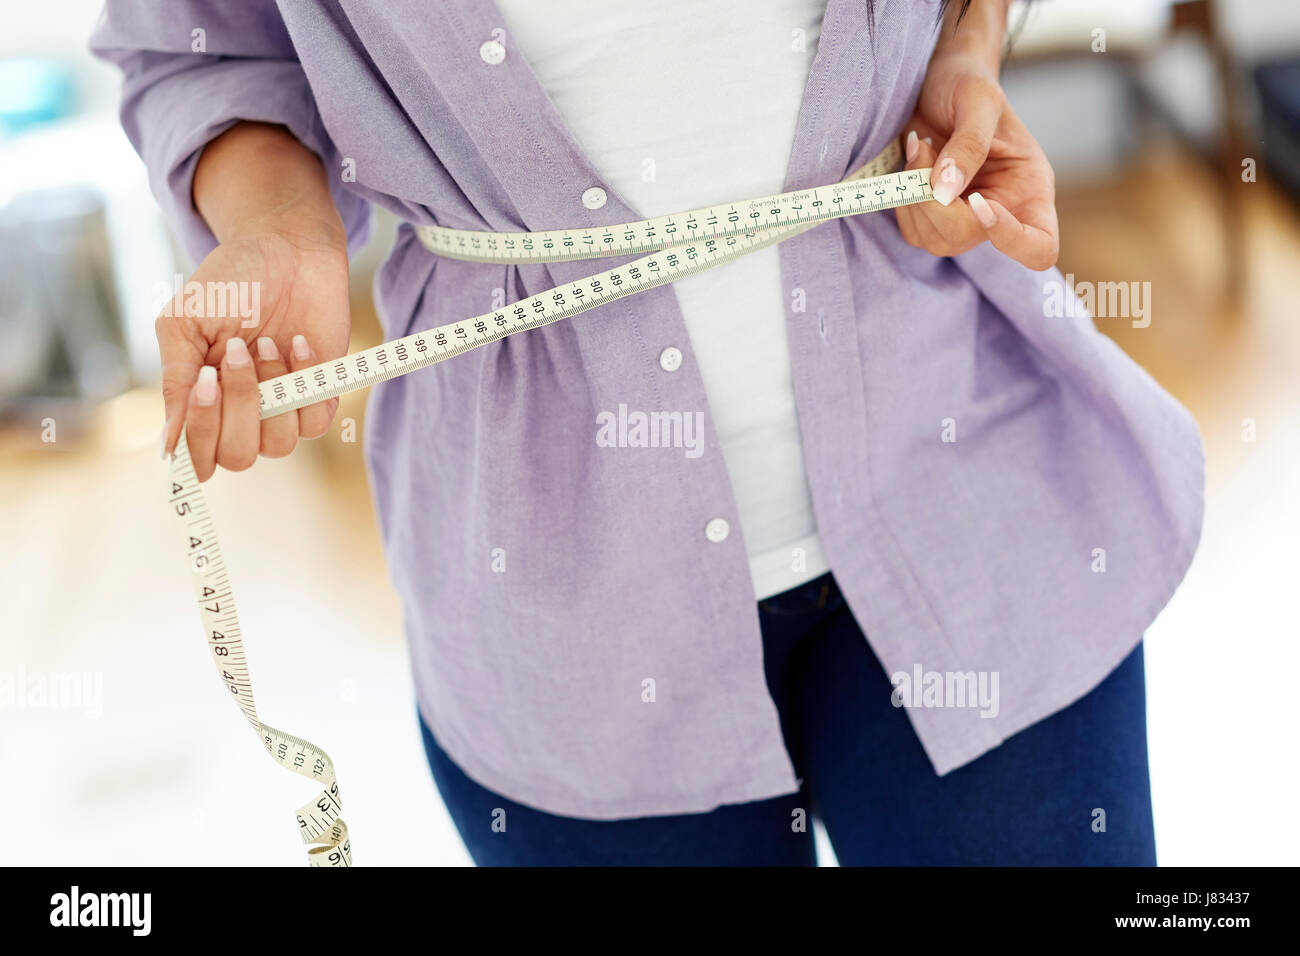 Woman holding tape measure around her waist - Stock Image